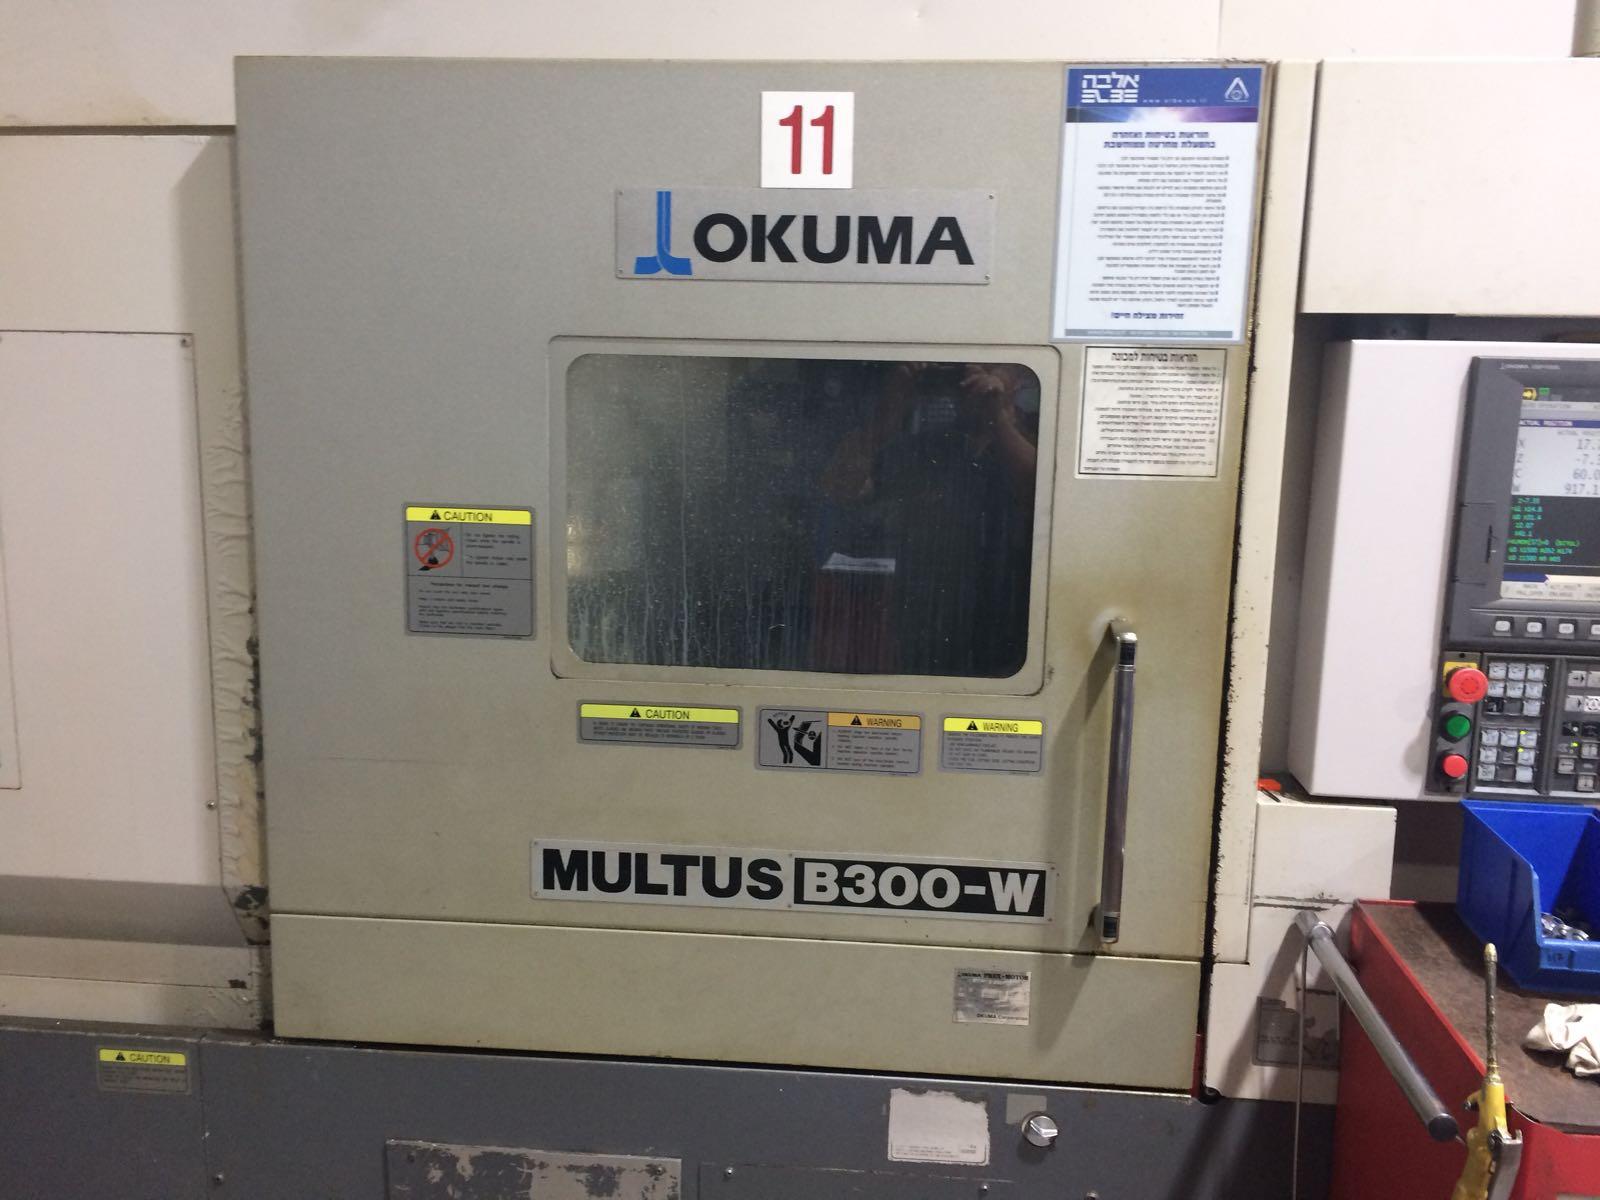 OKUMA – MULTUS B300-W 2009